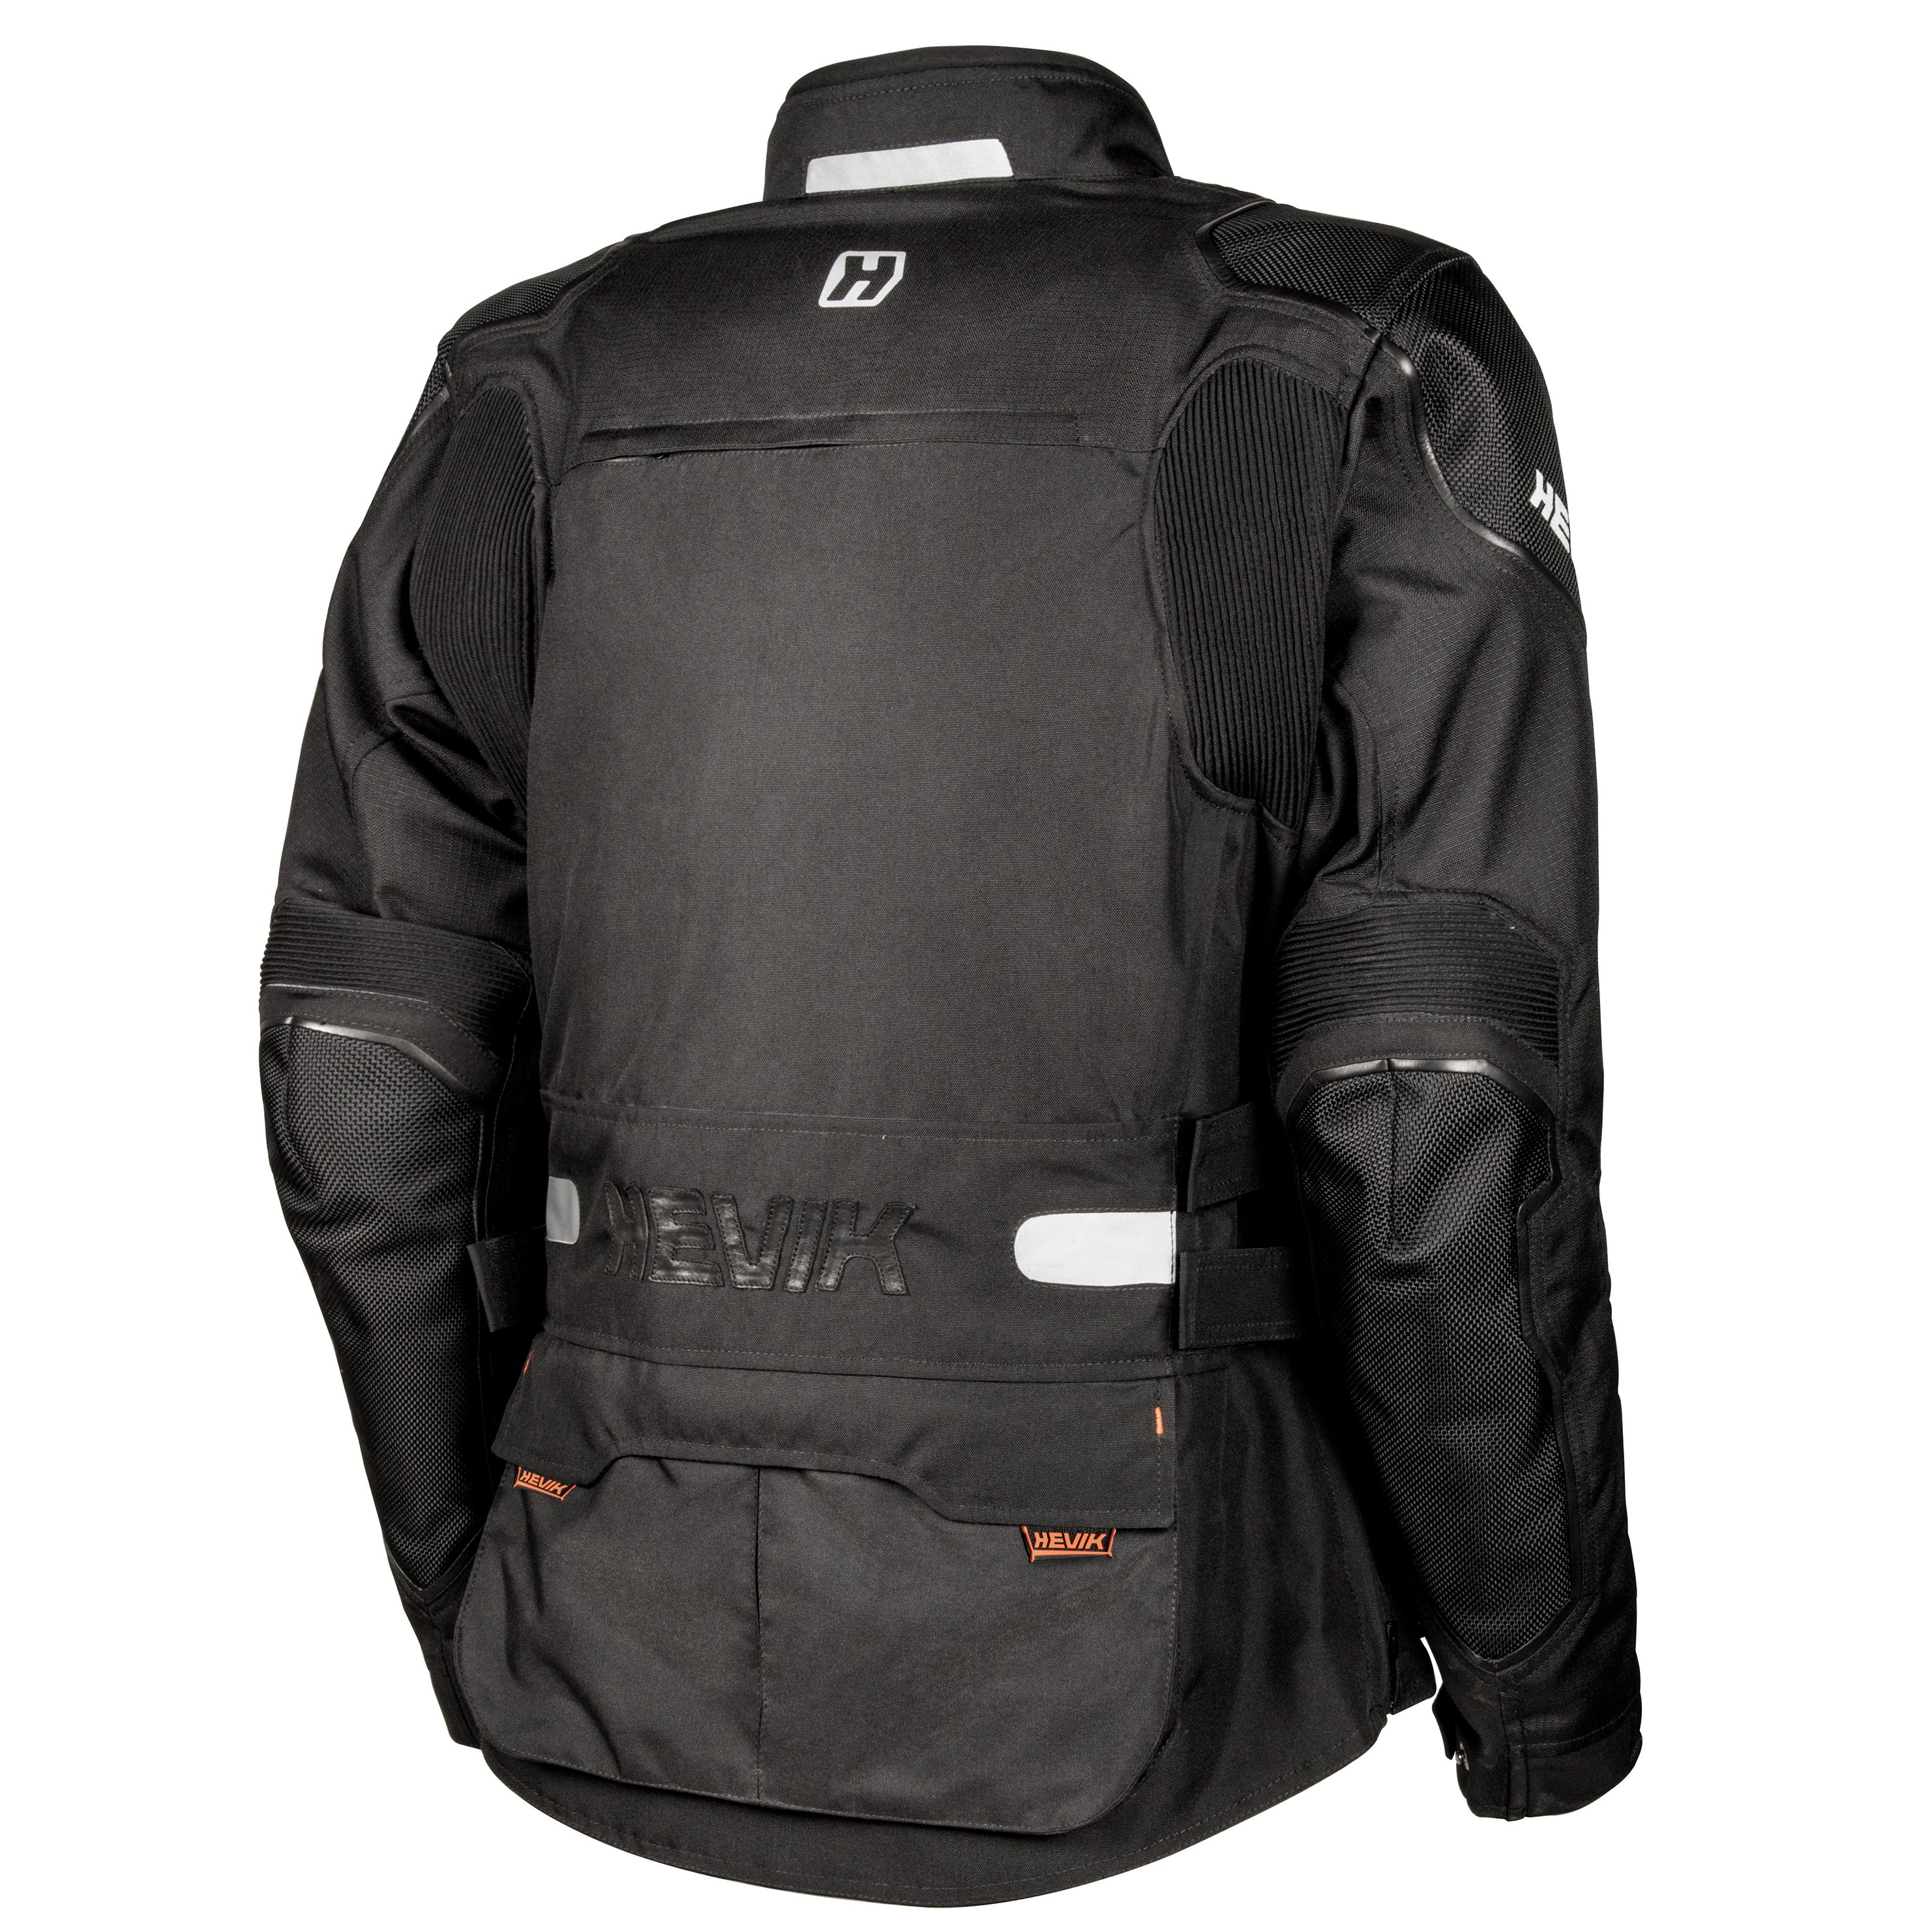 Stroke 50/cc 70/cc 90/cc 110/cc 125/cc 140/CC taotao SUNL Baja Qazaky 90/cm regolabile della frizione per Pit Dirt bike 4